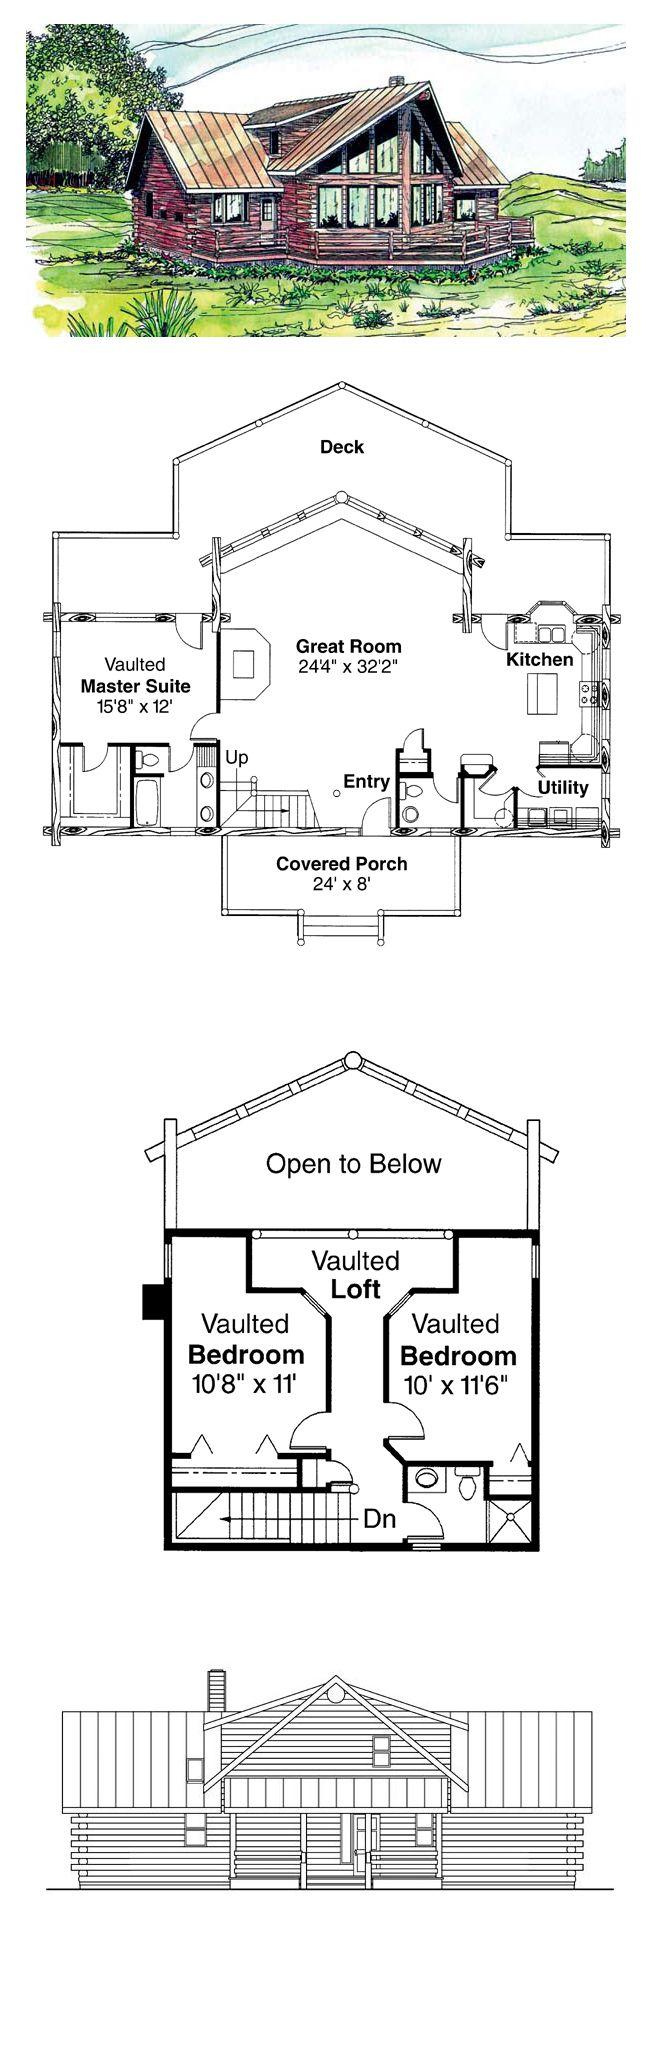 Log Cabin Style COOL House Plan ID: chp-20178 | Total Living Area: 1987 sq. ft., 3 bedrooms  2.5 bathrooms. #houseplan #logcabinplan